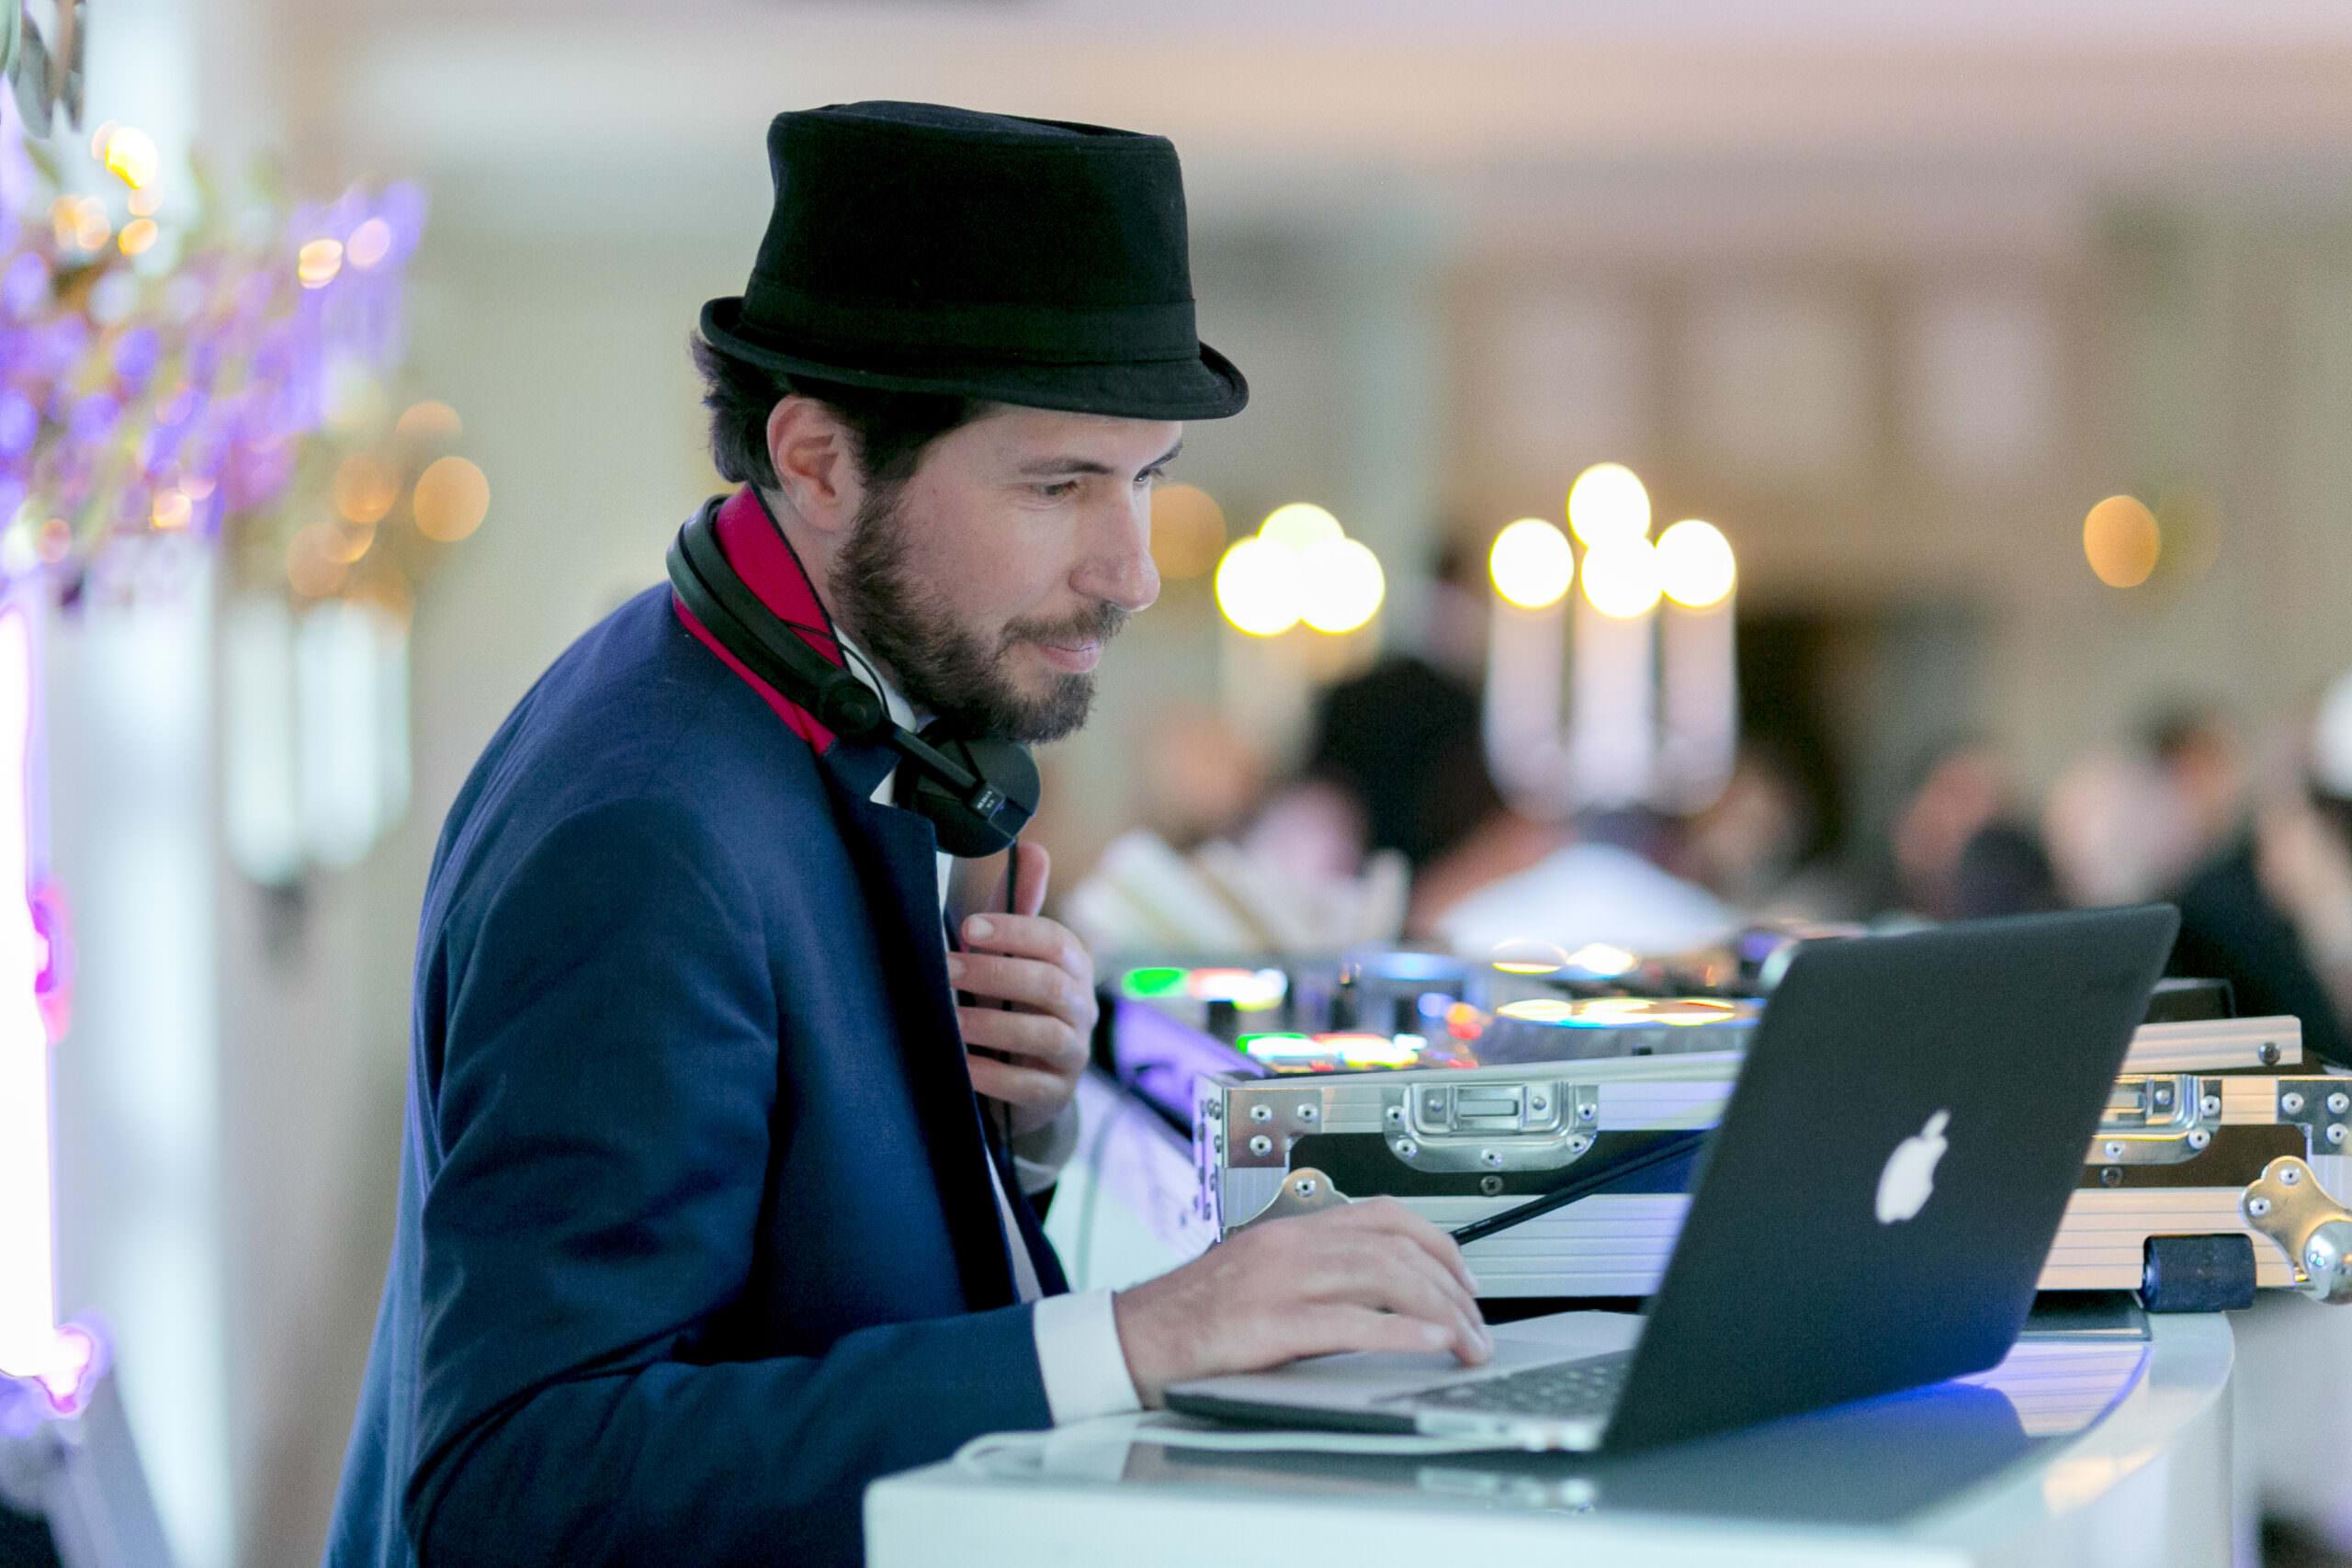 DJ Markus Rosenbaum wählt am Laptop Musikstücke aus